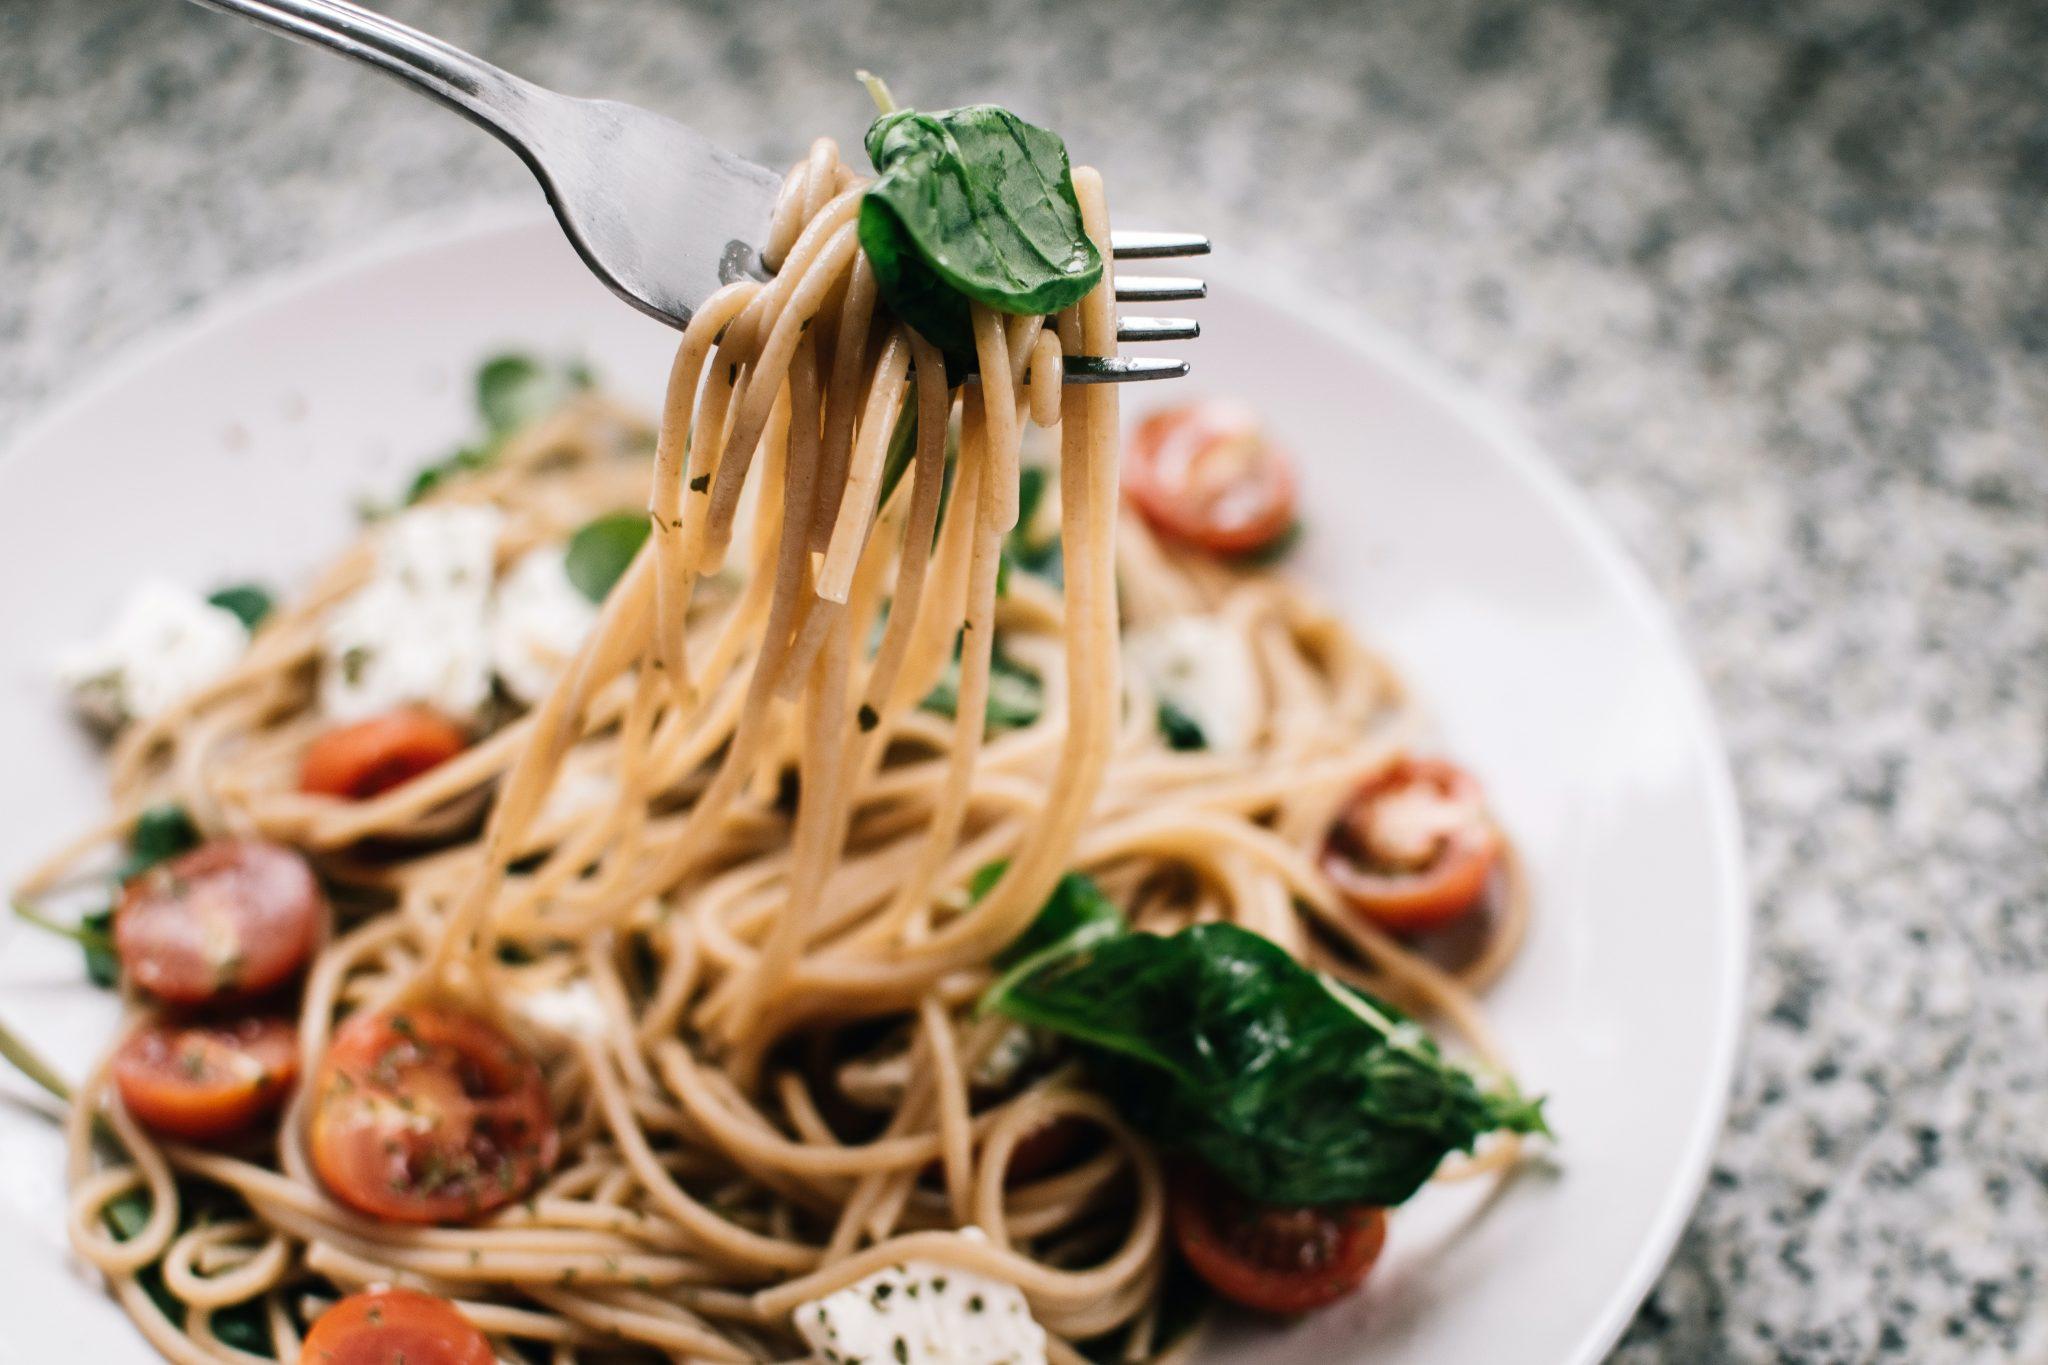 Fødevarestyrelsen tilbagekalder pasta